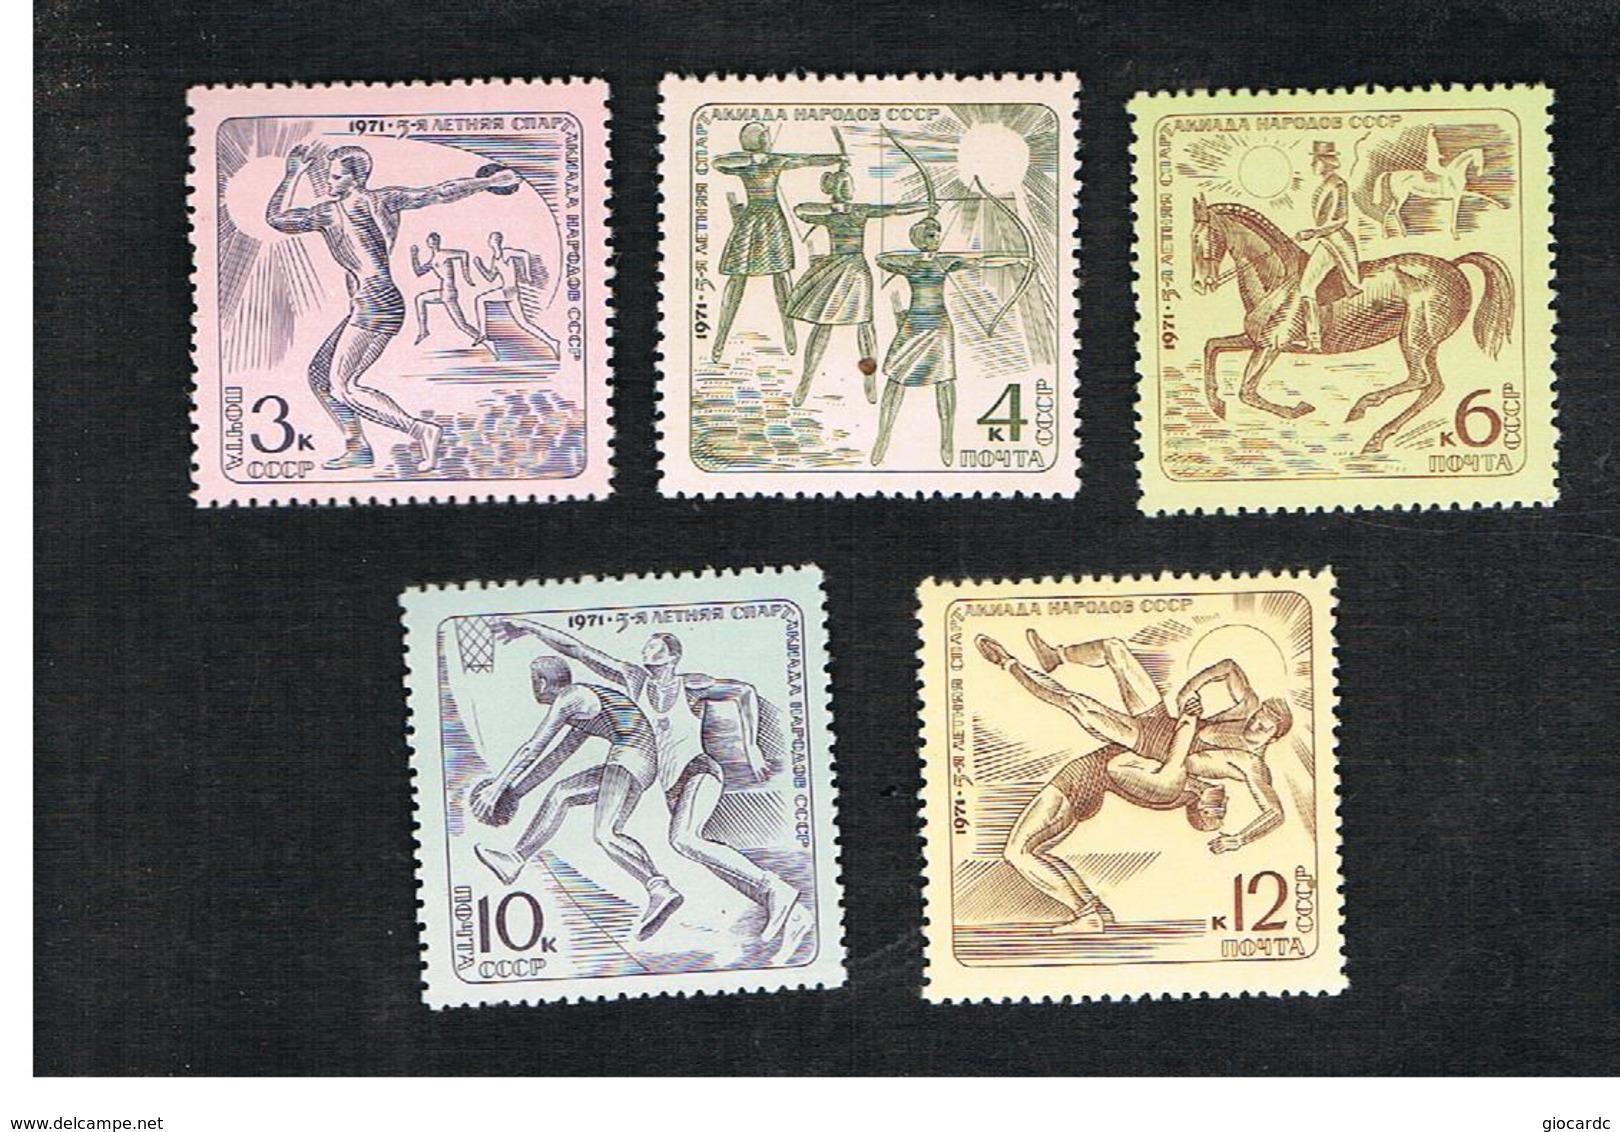 URSS -  YV. 3730.3734 -  1971  SUMMER SPARTAKIAD (COMPLET SET OF 5)   - MINT** - 1923-1991 URSS